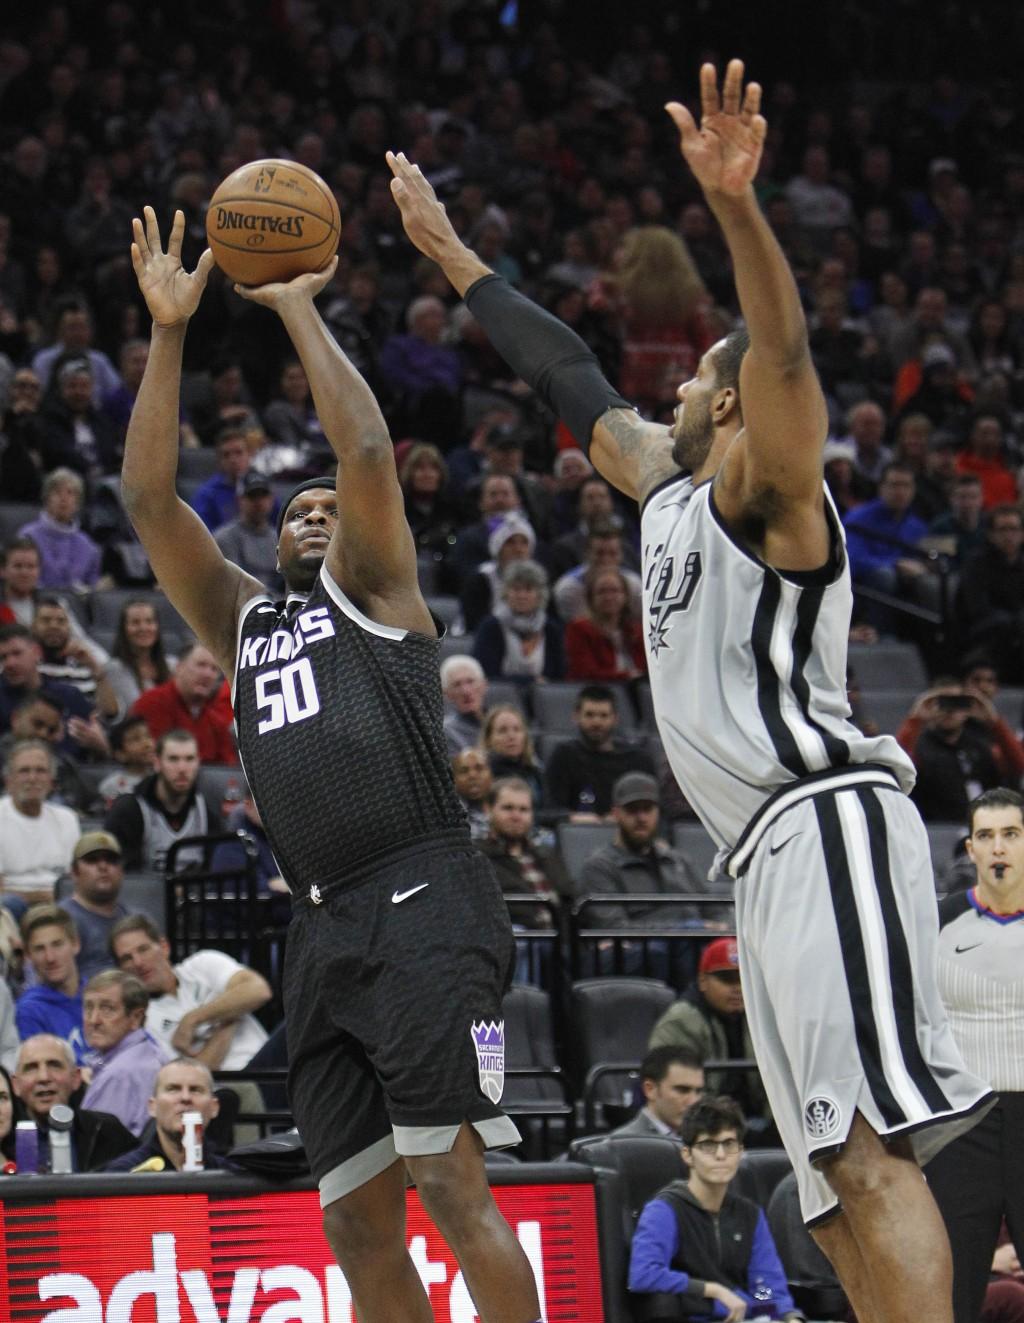 Sacramento Kings forward Zach Randolph (50) shoots over San Antonio Spurs' LaMarcus Aldridge during the first half of an NBA basketball game in Sacram...